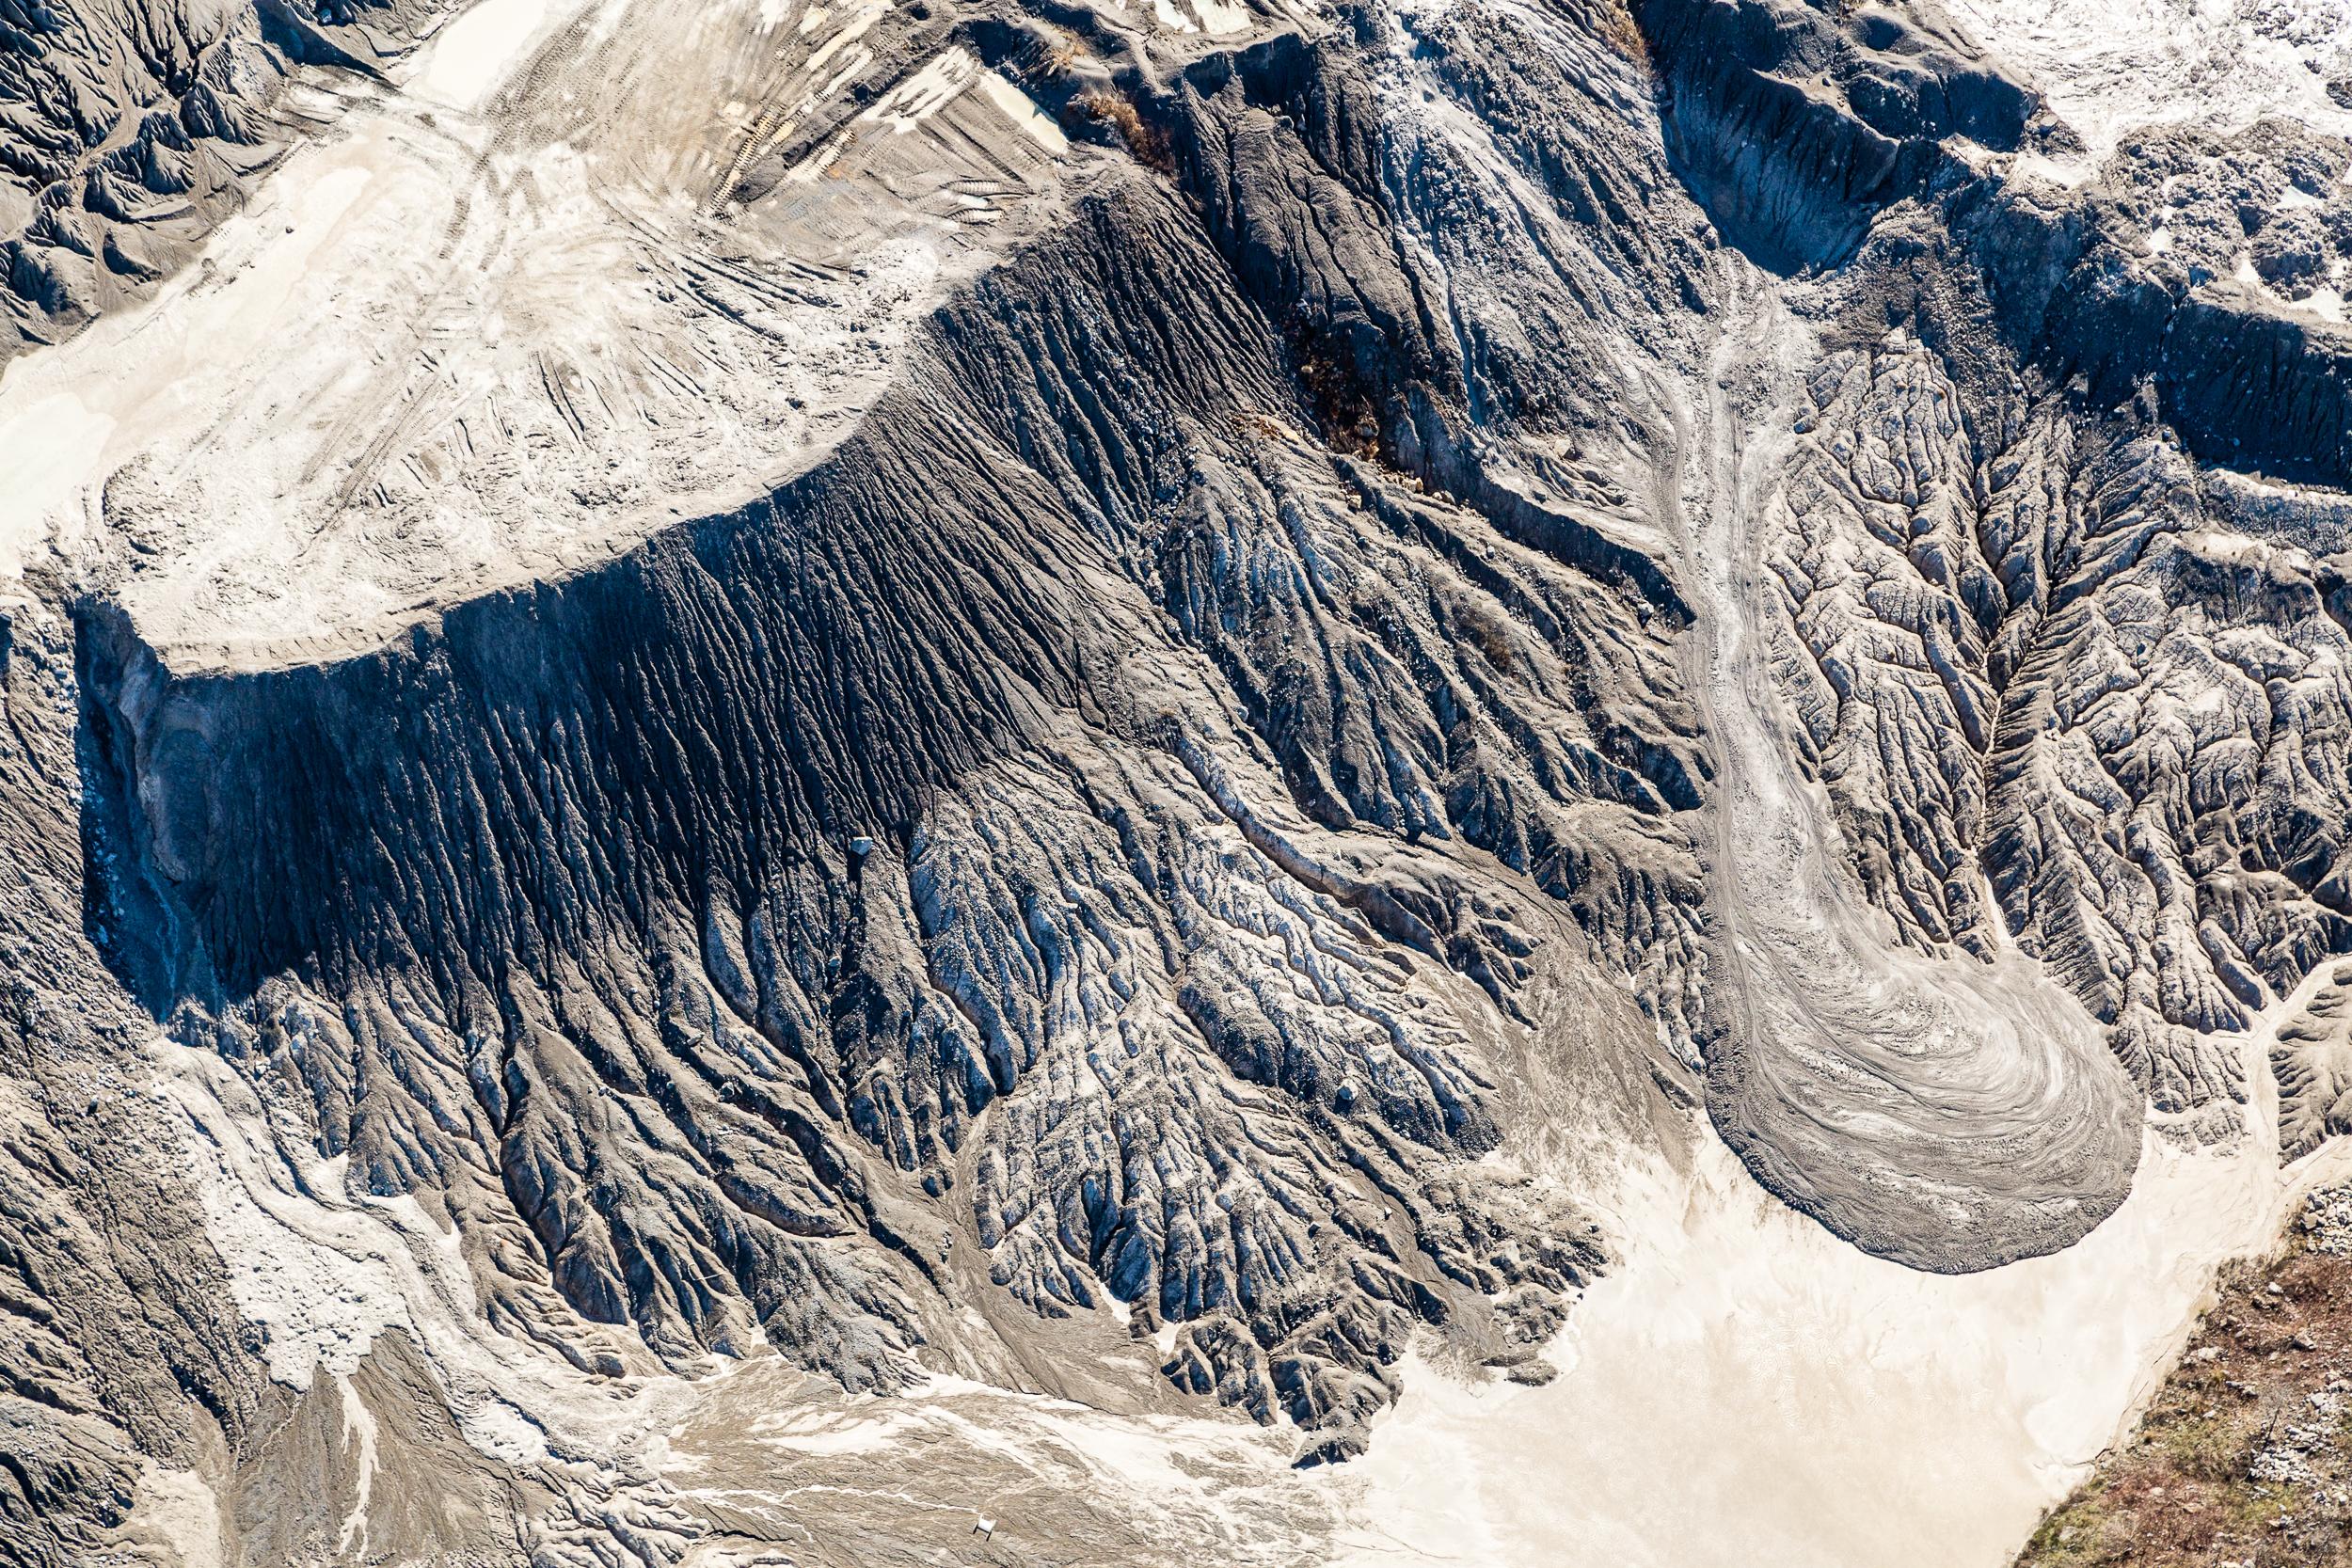 Quarry erosion patterns.